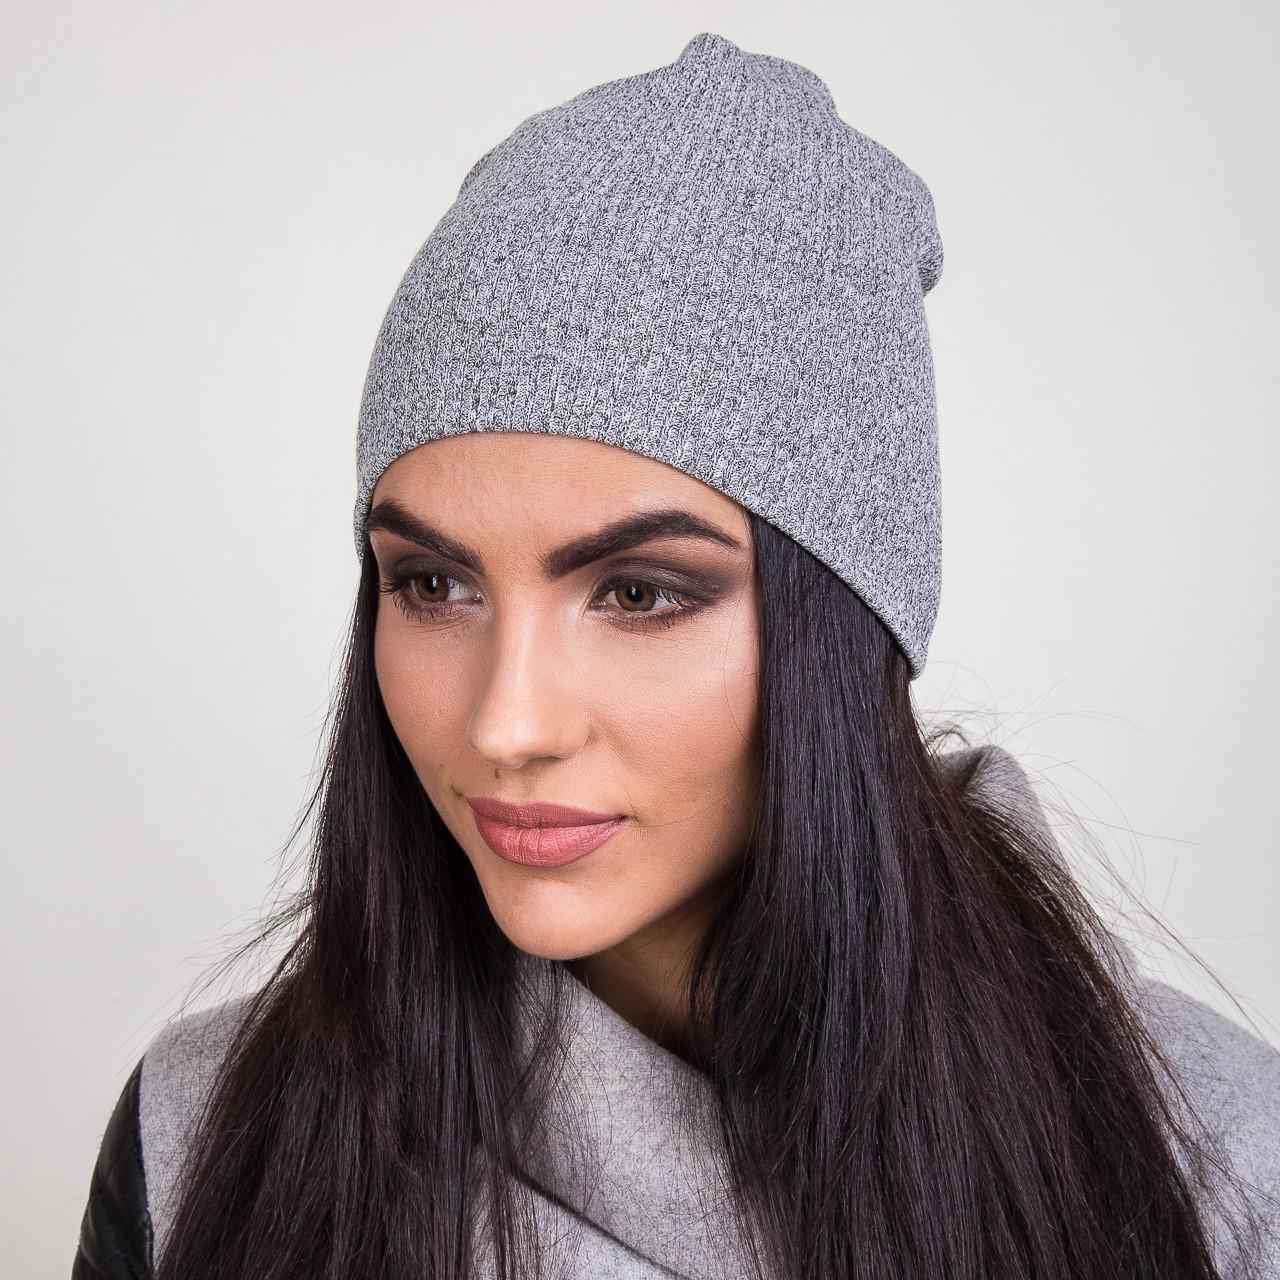 Женская вязанная шапка на весну 2017 - Артикул 2065 (серая)